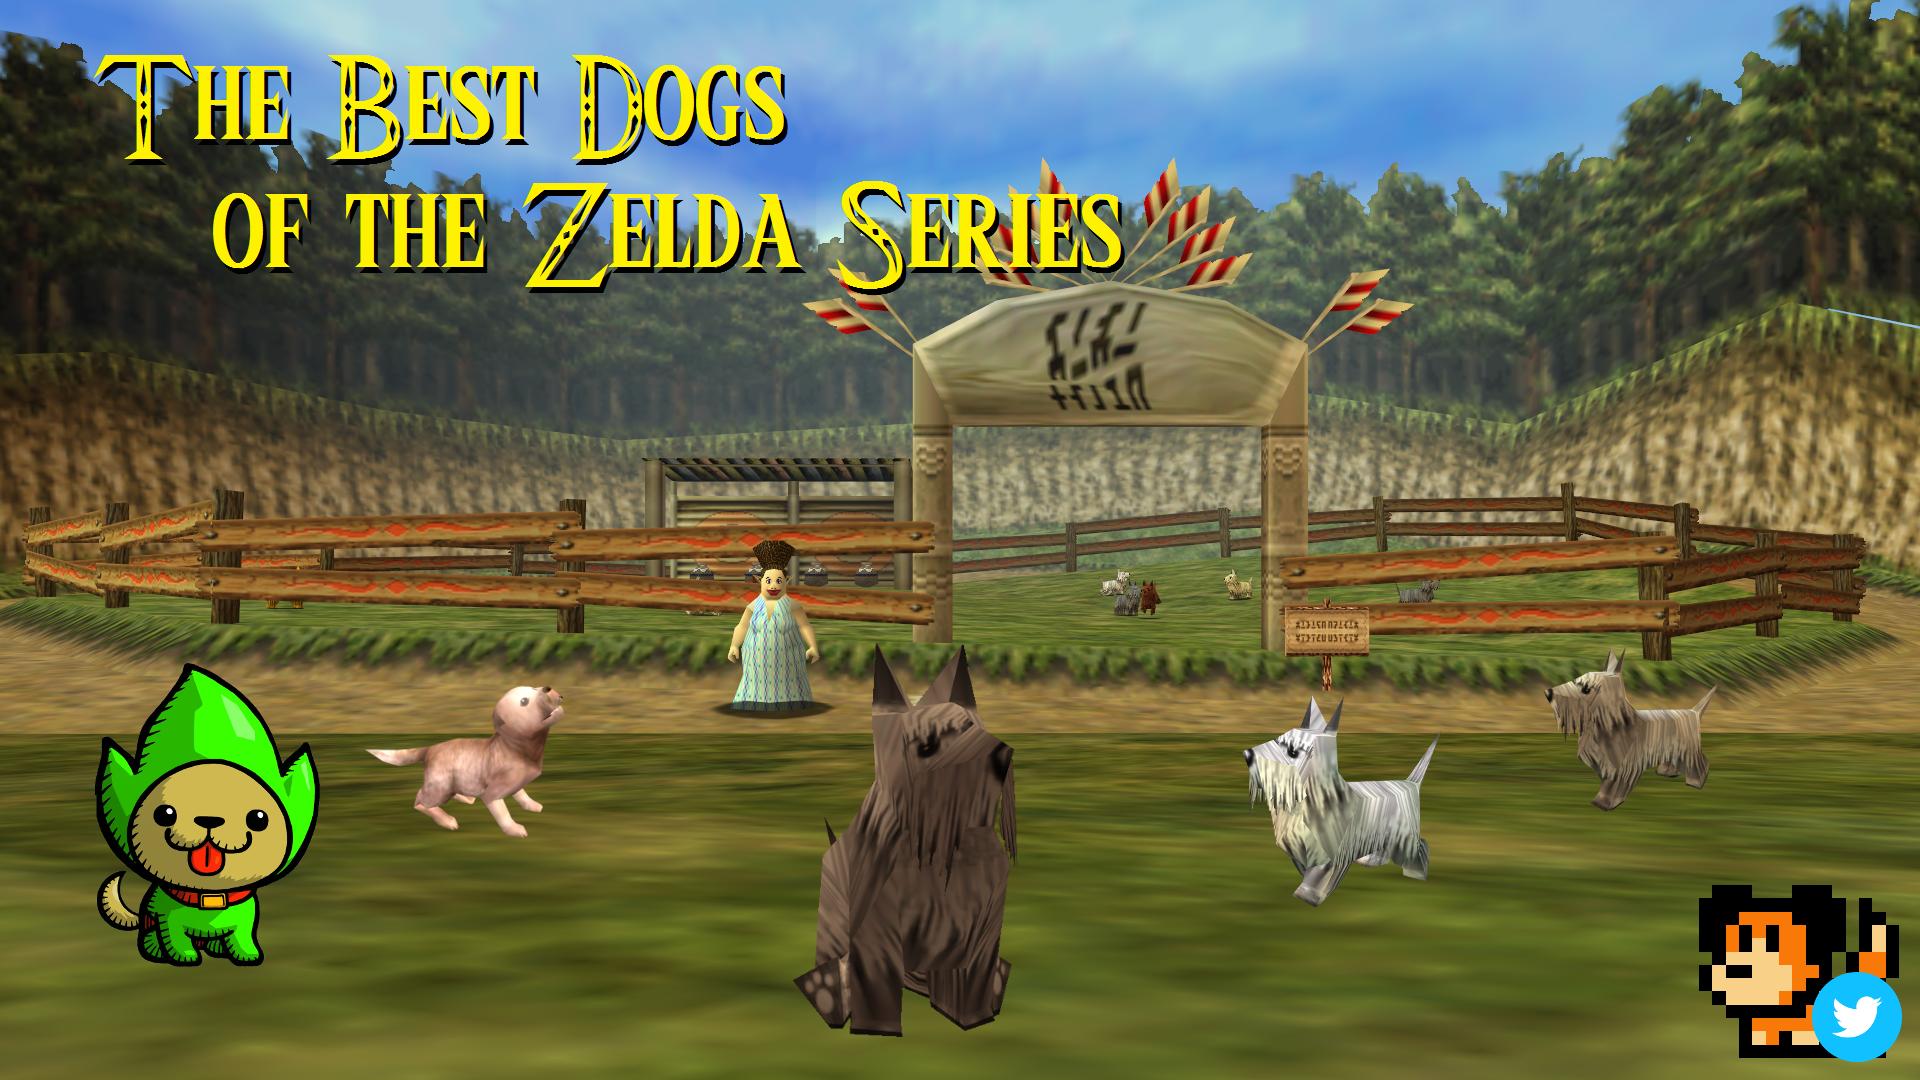 A Hero's Best Friend: The Best Dogs of the Zelda Series